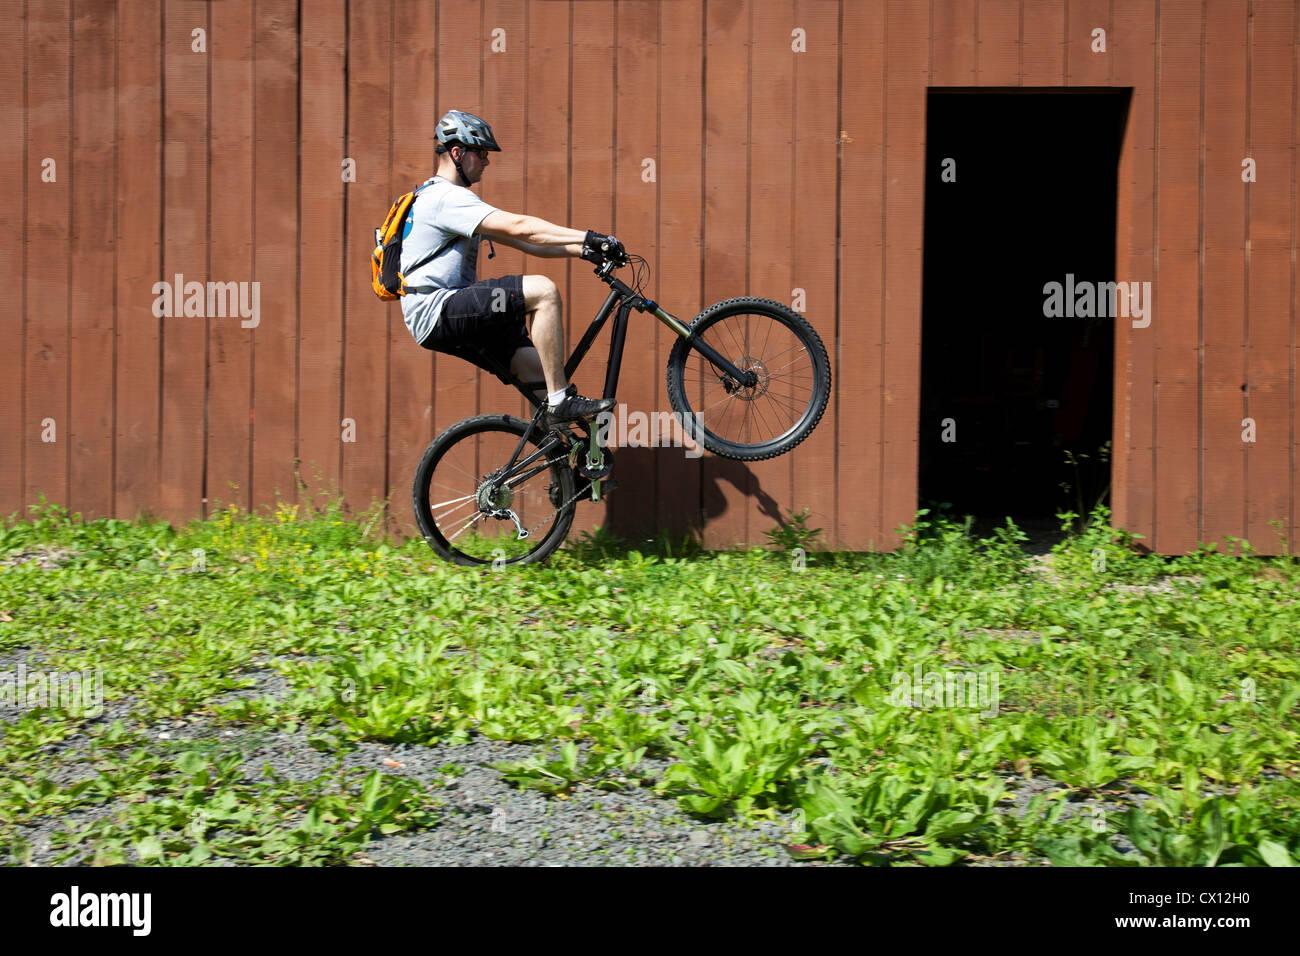 Mountain biker riding on one wheel outside barn Stock Photo